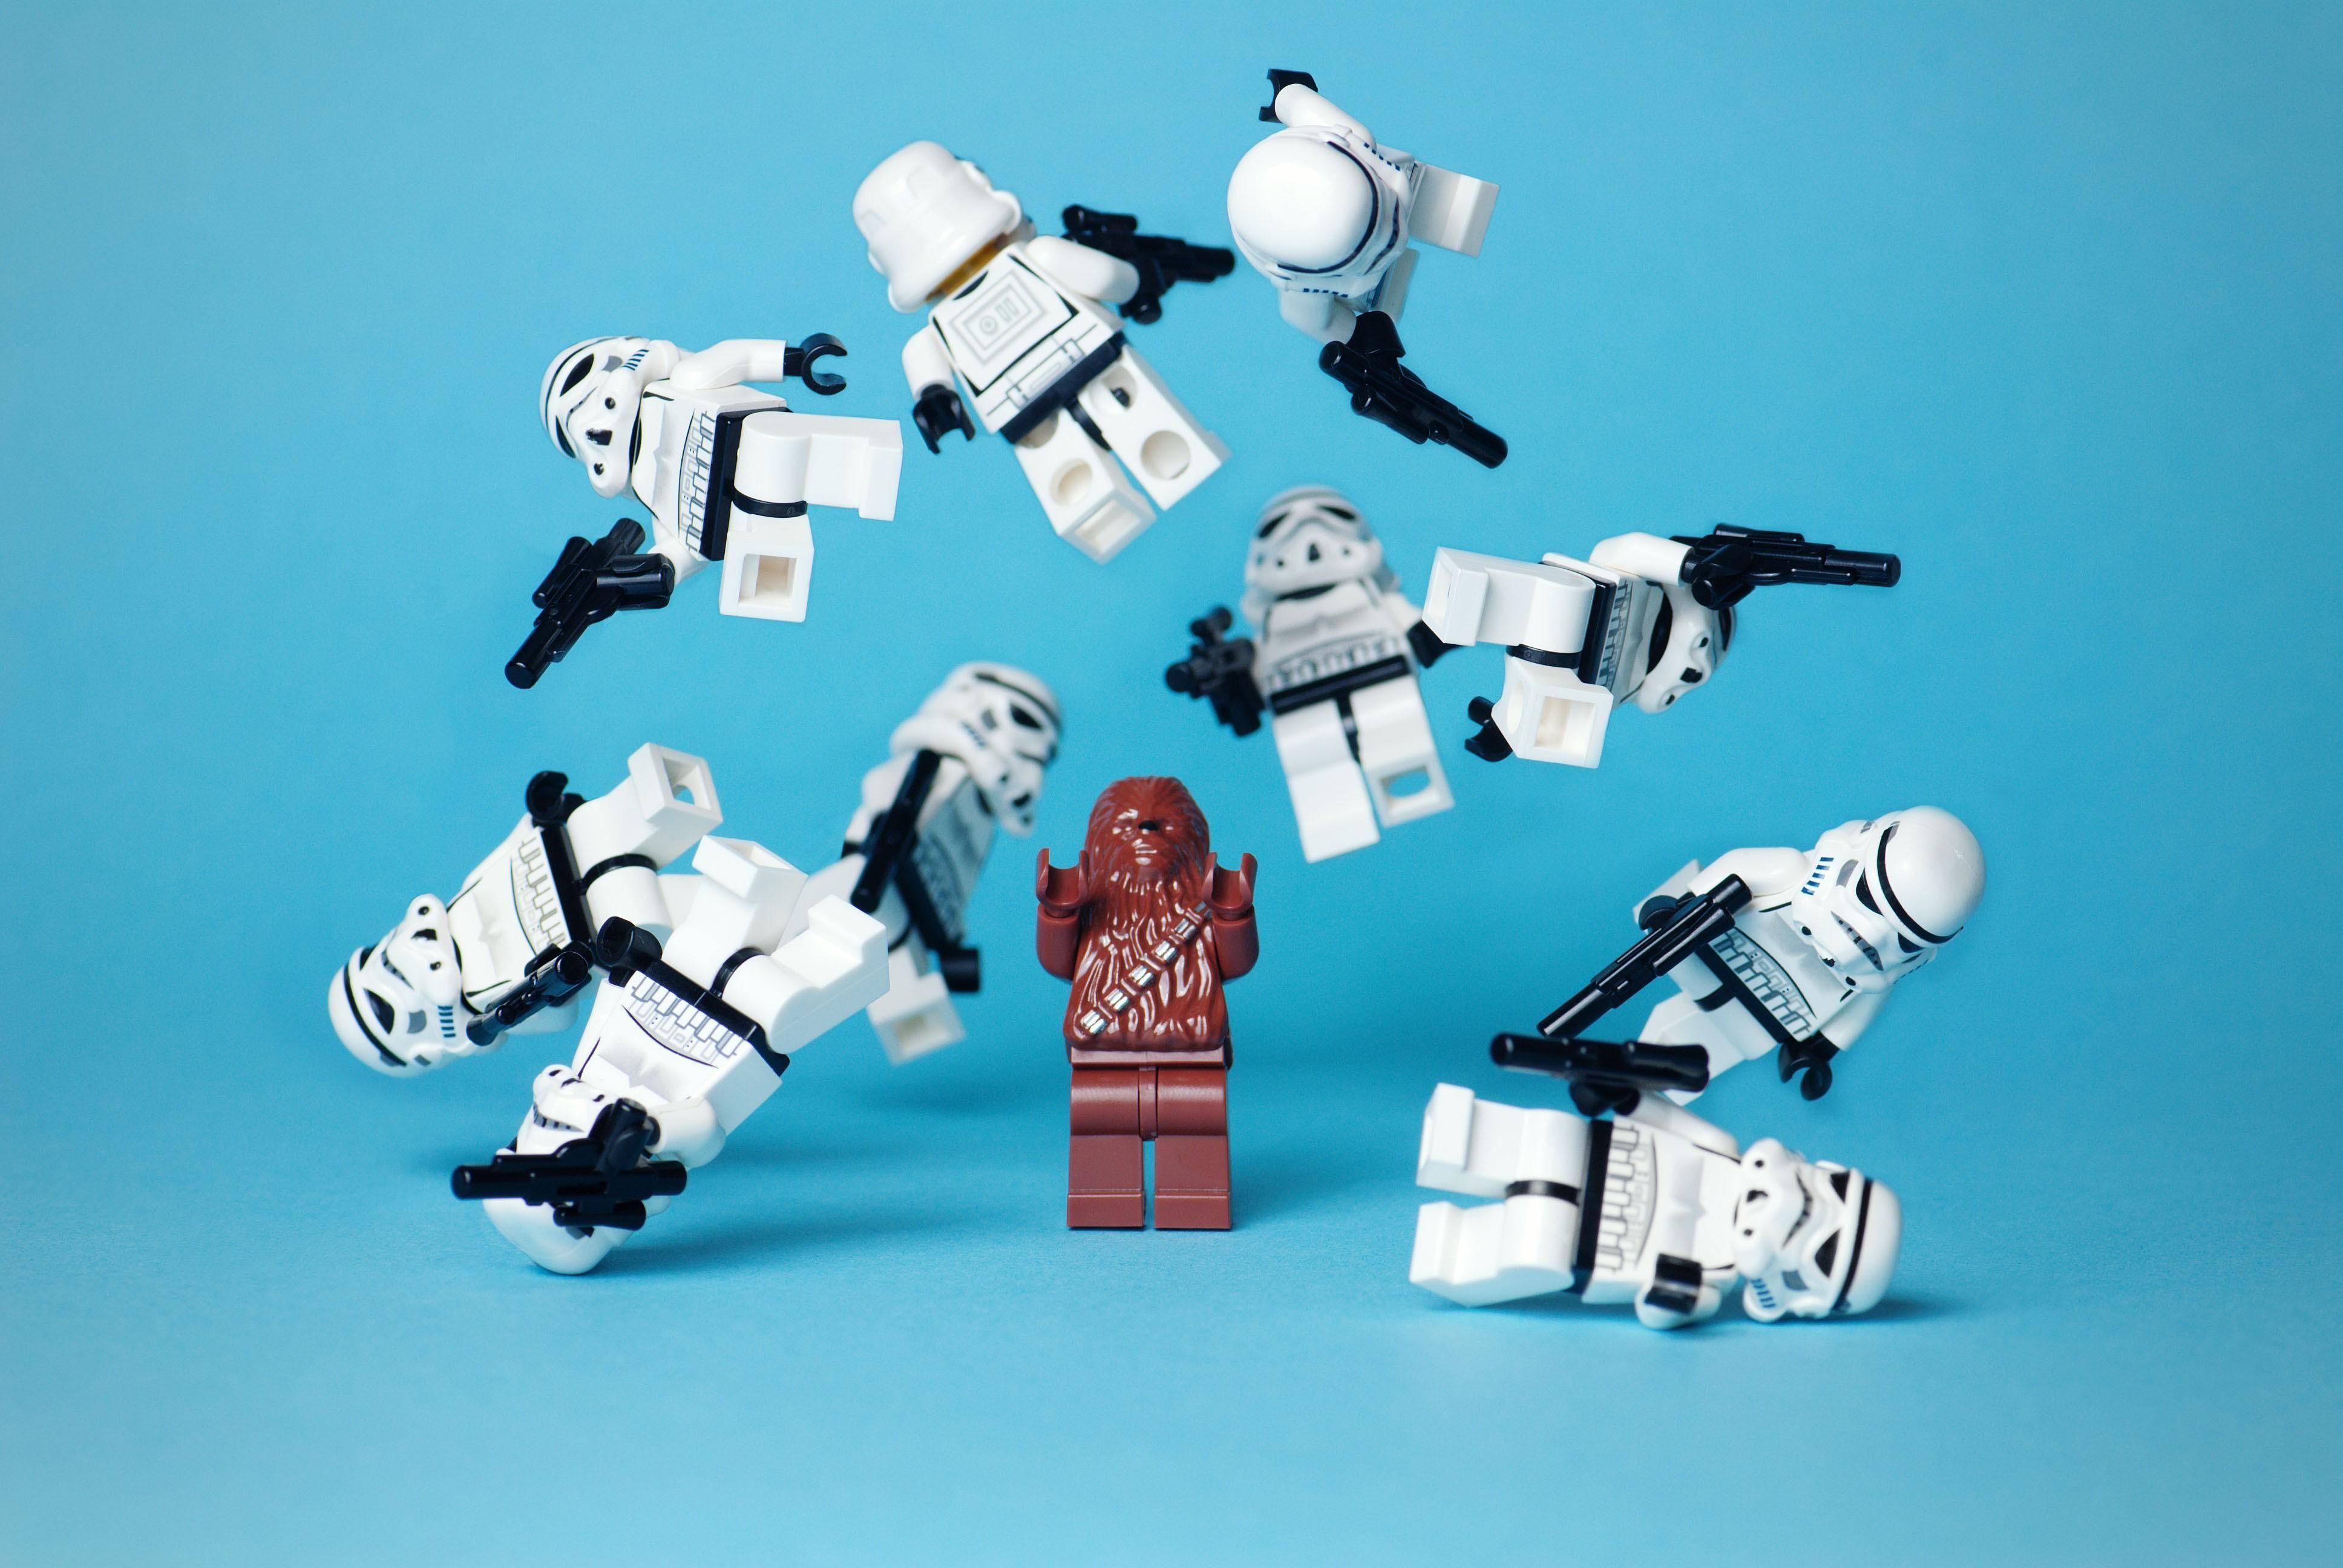 lego star wars wallpaper hd #578783 | hary potter ideas | pinterest